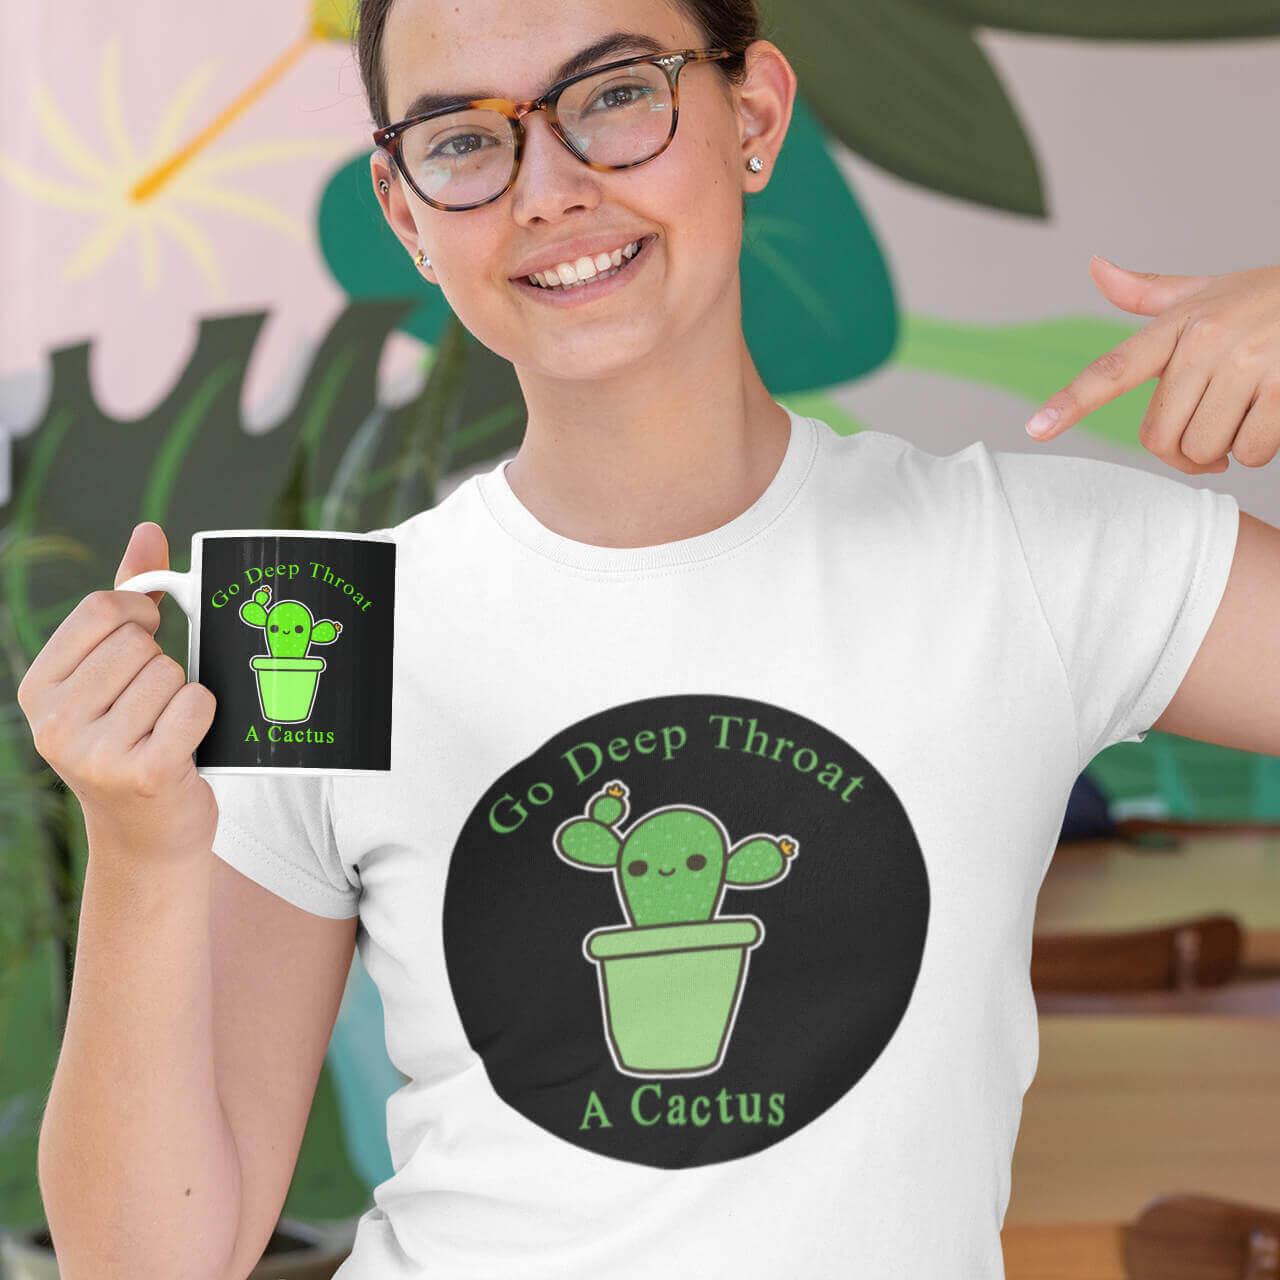 Go Deep Throat A Cactus T-Shirt